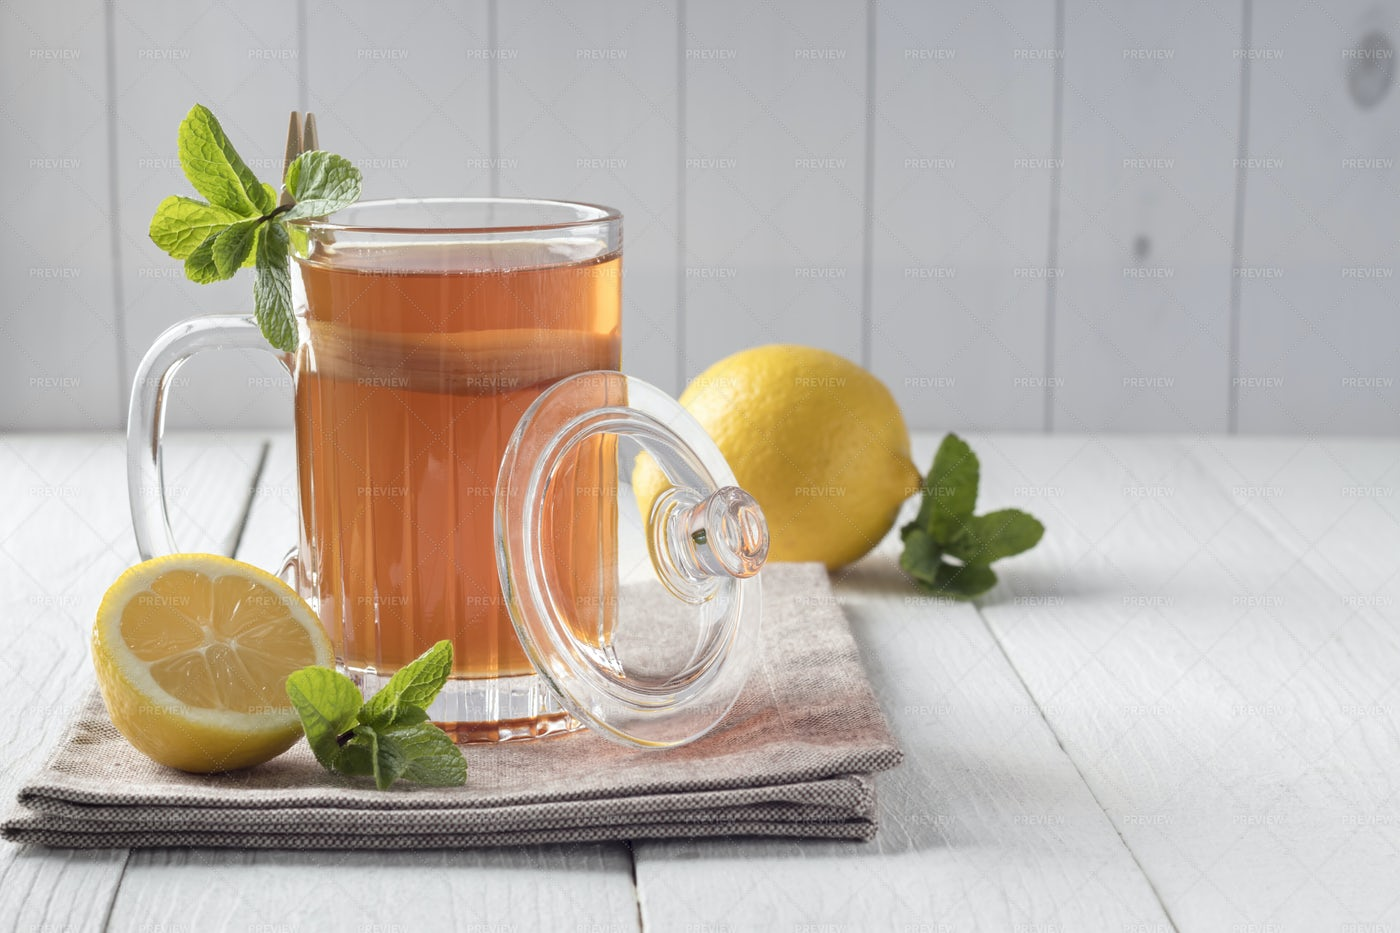 Fermented Kombucha Probiotic Drink: Stock Photos